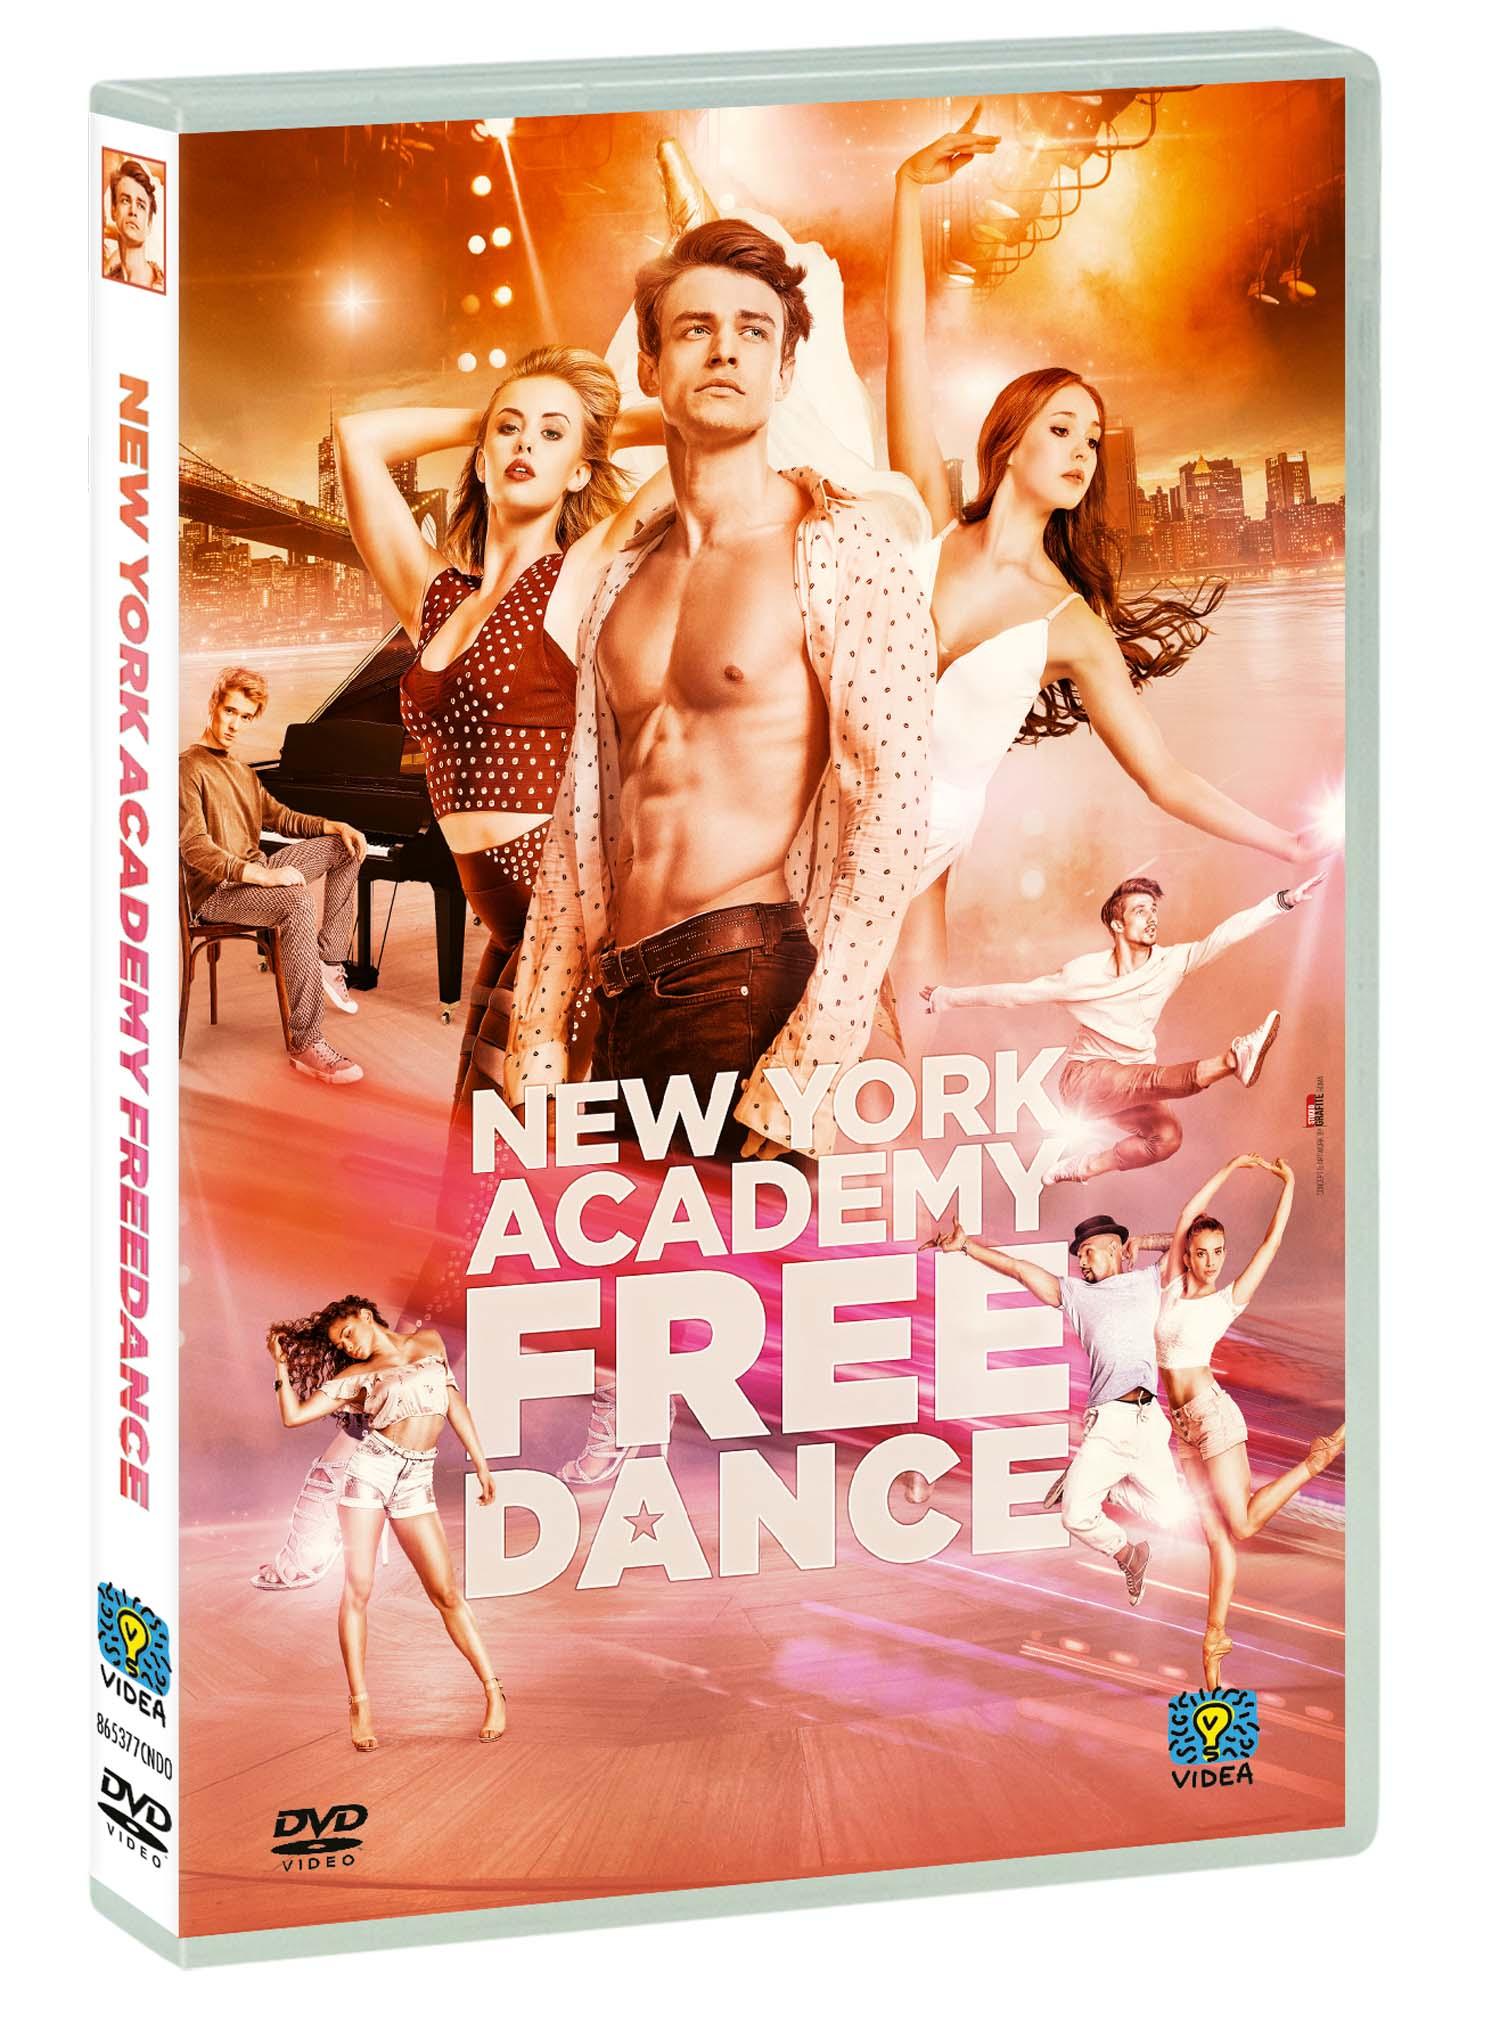 NEW YORK ACADEMY - FREEDANCE (DVD)